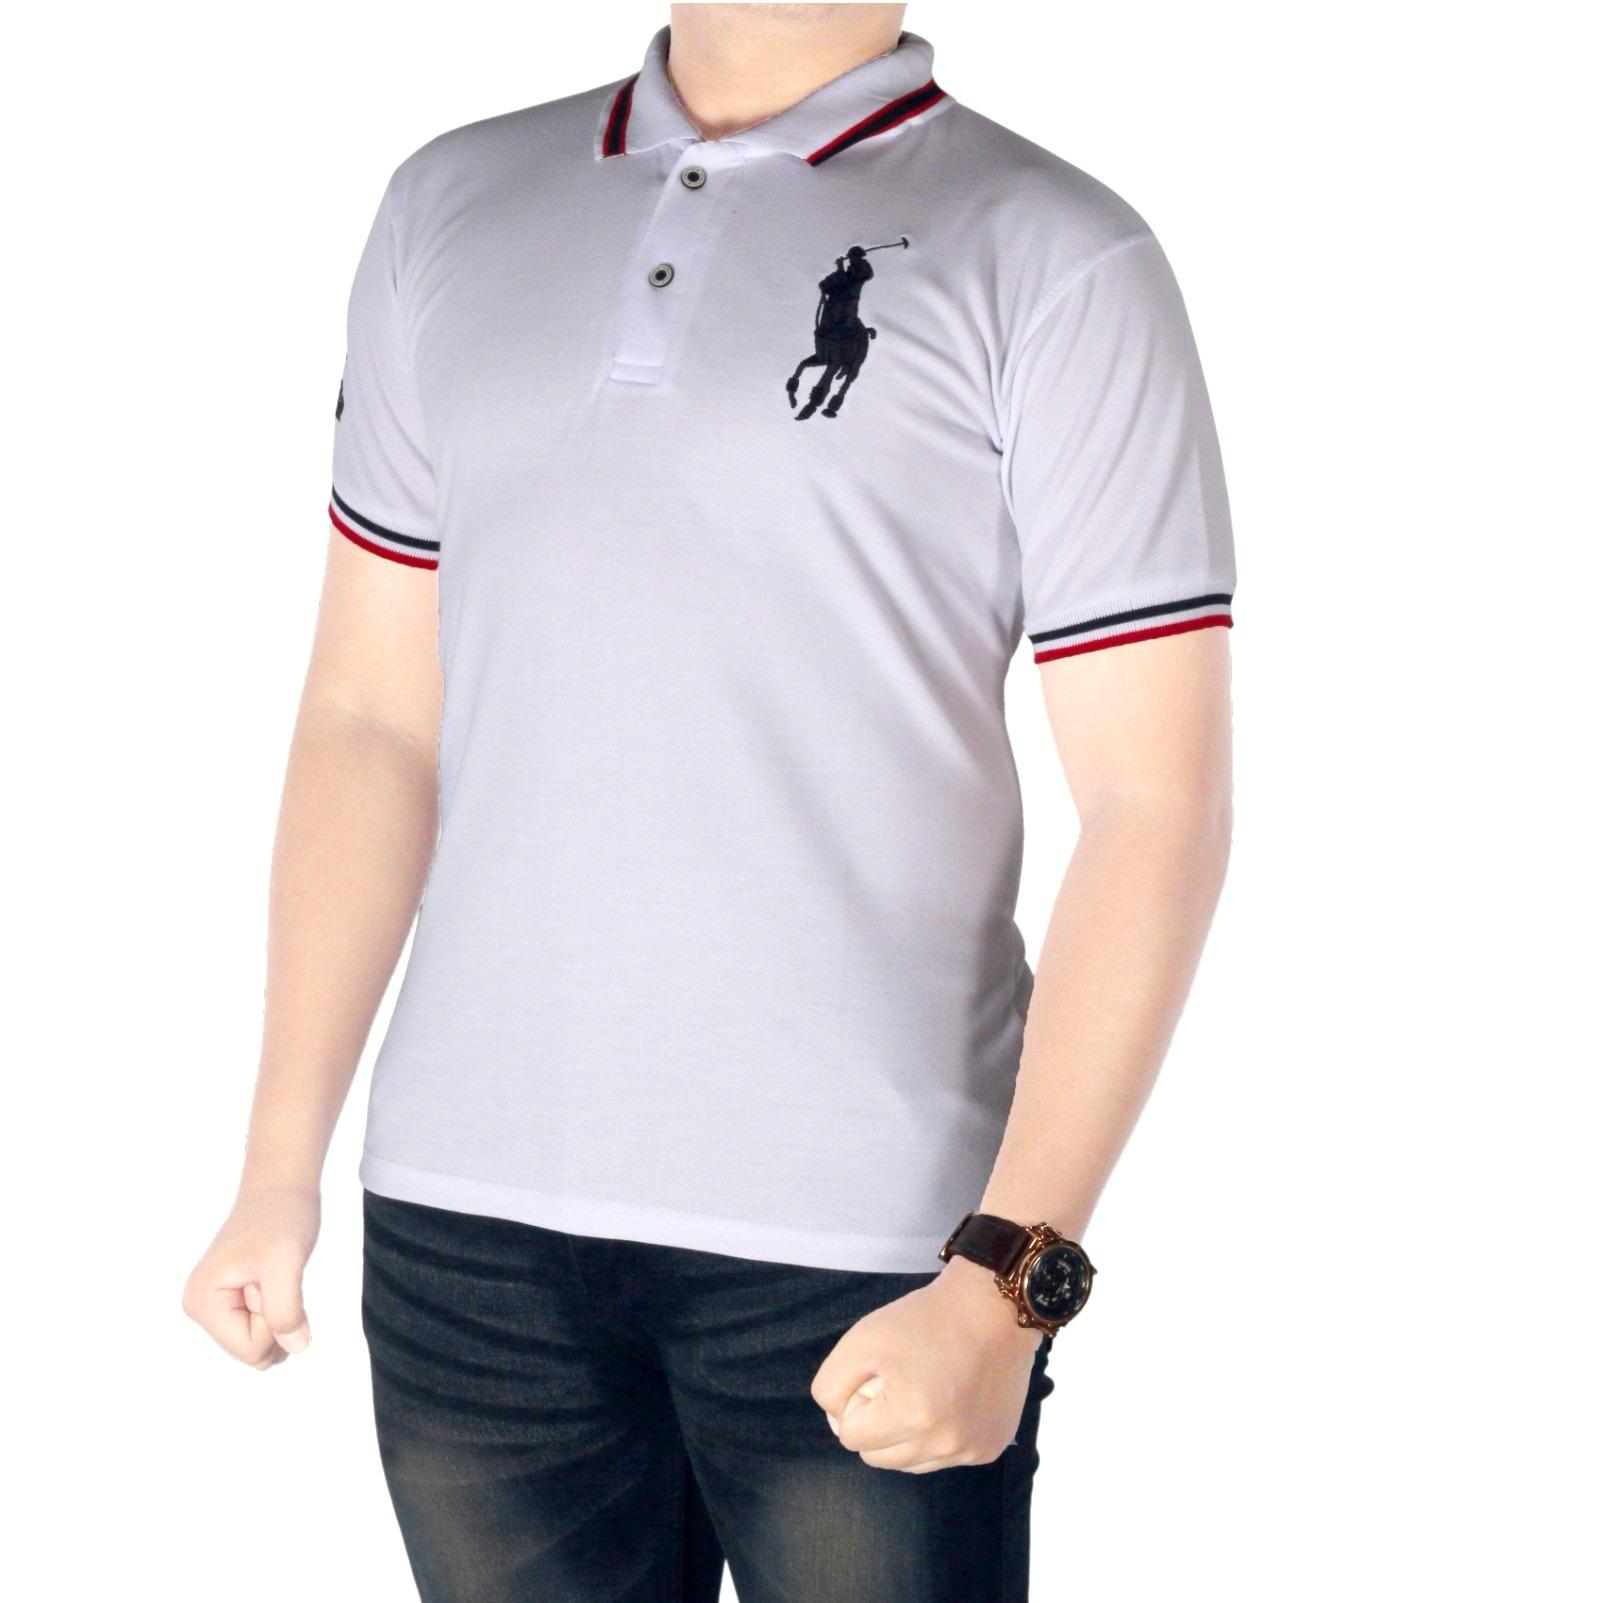 Berapa Harga Dgm Fashion1 Kaos Polo Pria Putih Kuda Kaos Polo Kerah Polo Kaos Polo Men Poloshirt Baju Kaos Kaos Distro Polo Distro Kaos Murah Kaos Casual Kaos Polos Polo Polos Ip 4547 Di Dki Jakarta